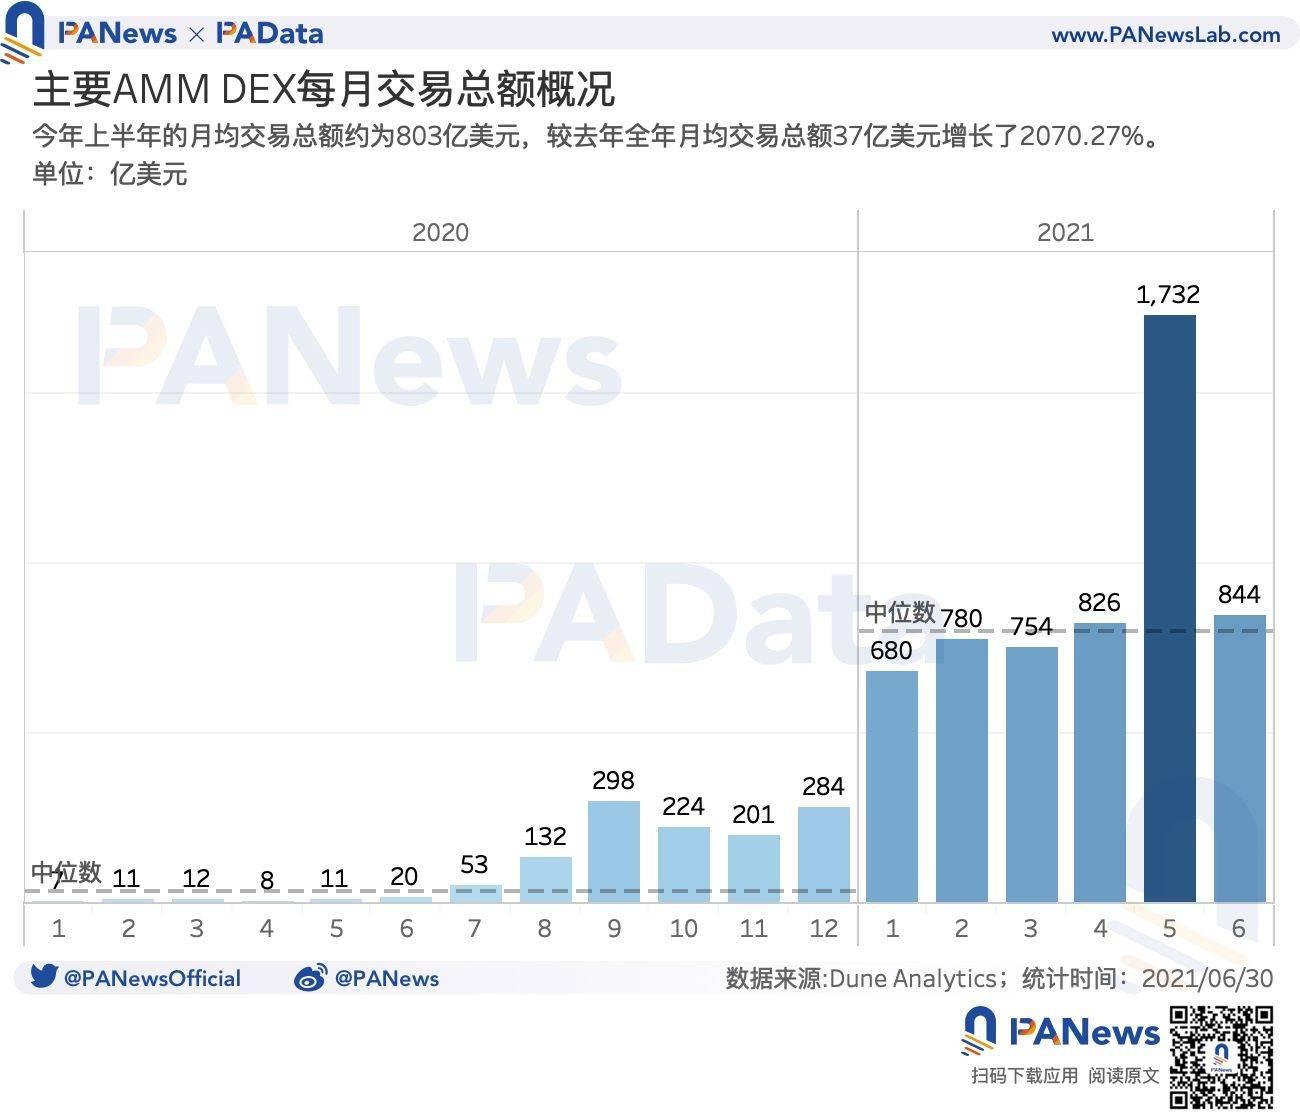 DeFi半年报:独立地址增速放缓,但总锁仓量仍增长超300%